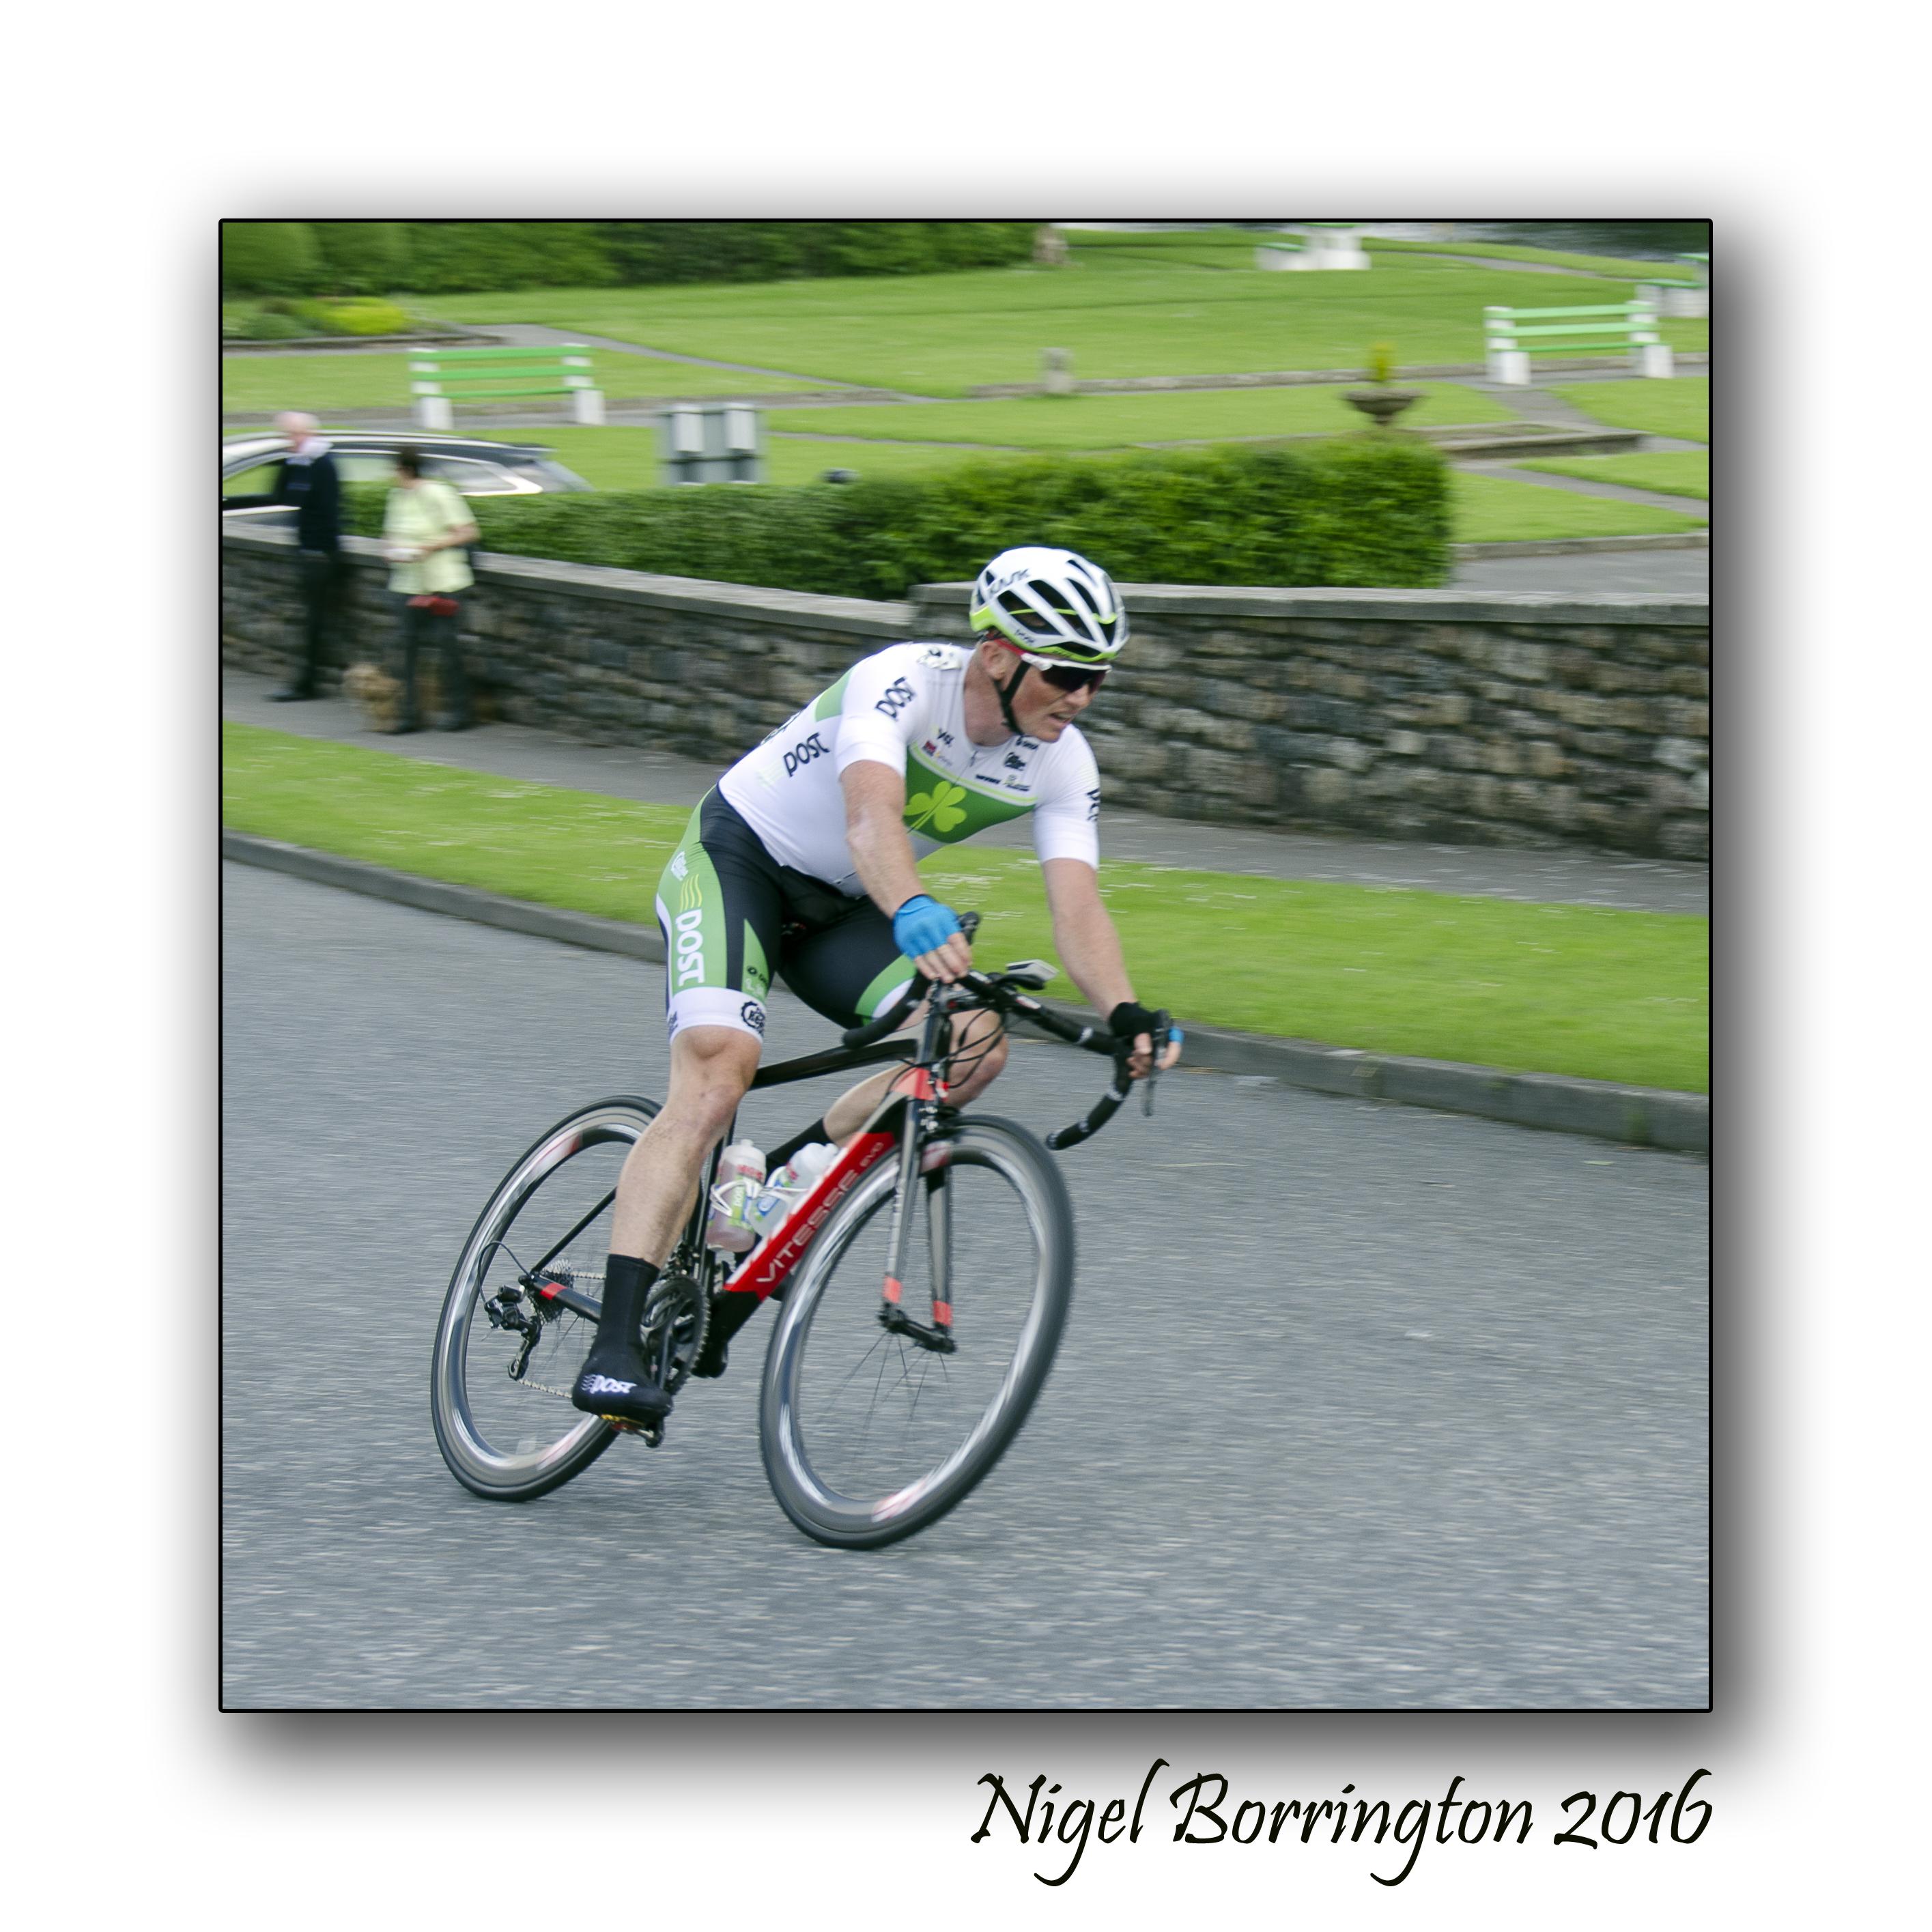 AnPost National Cycle Race 2016 Nigel Borrington 01